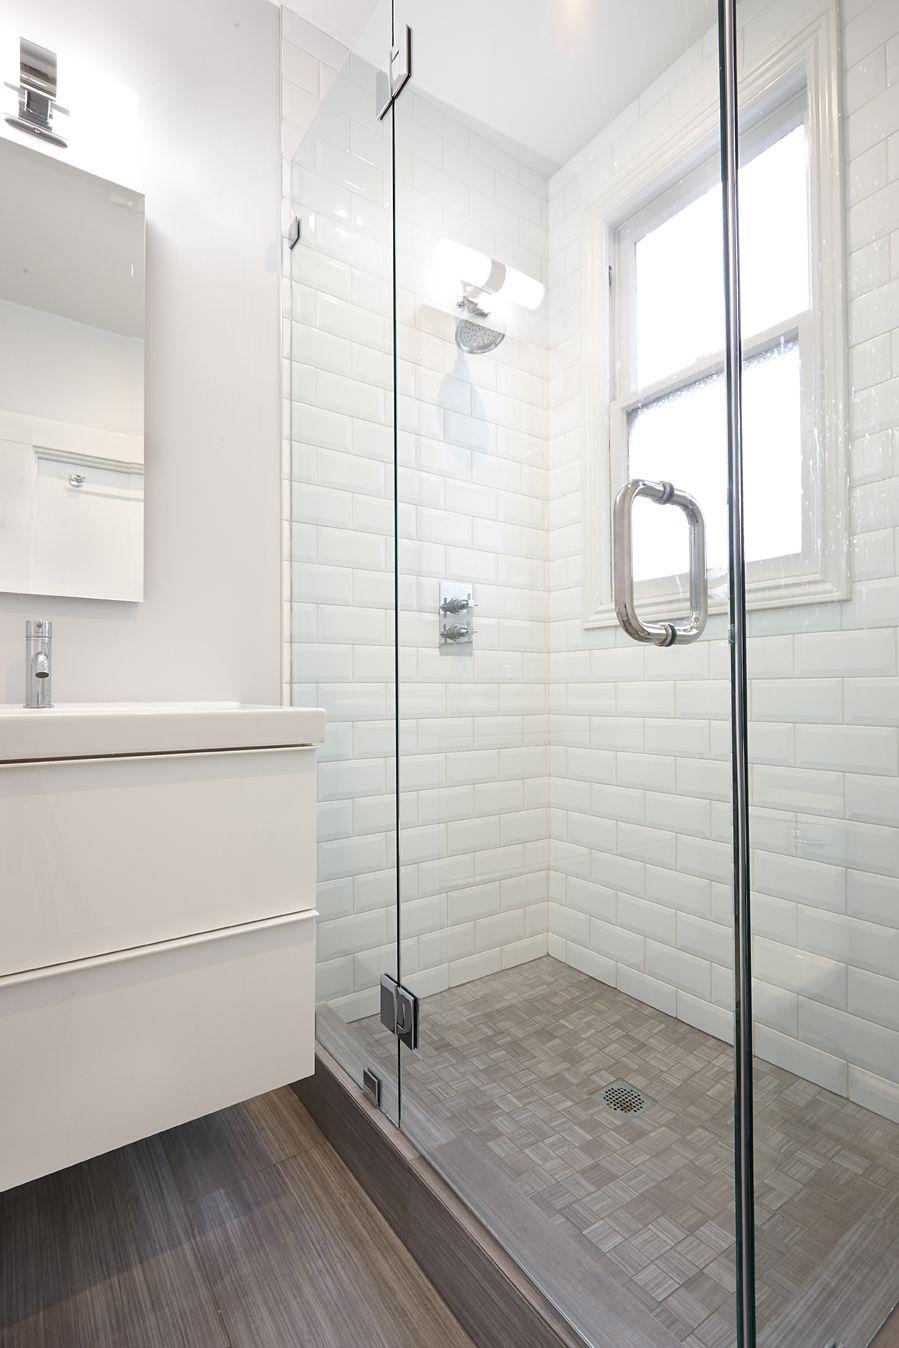 Beveled white subway tile with grey floor Nerland SF